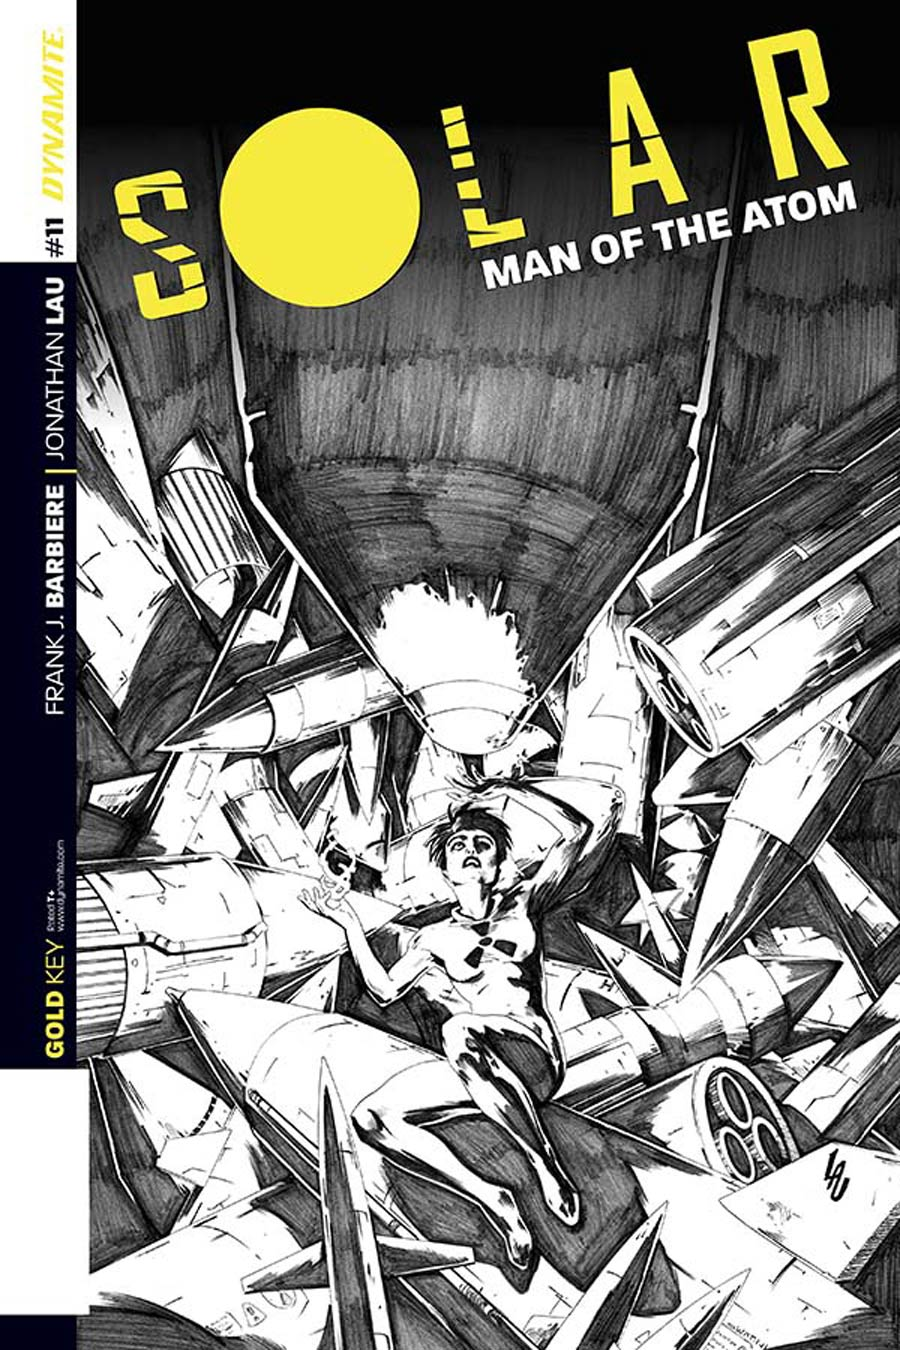 Solar Man Of The Atom Vol 2 #11 Cover D Incentive Jonathan Lau Black & White Cover